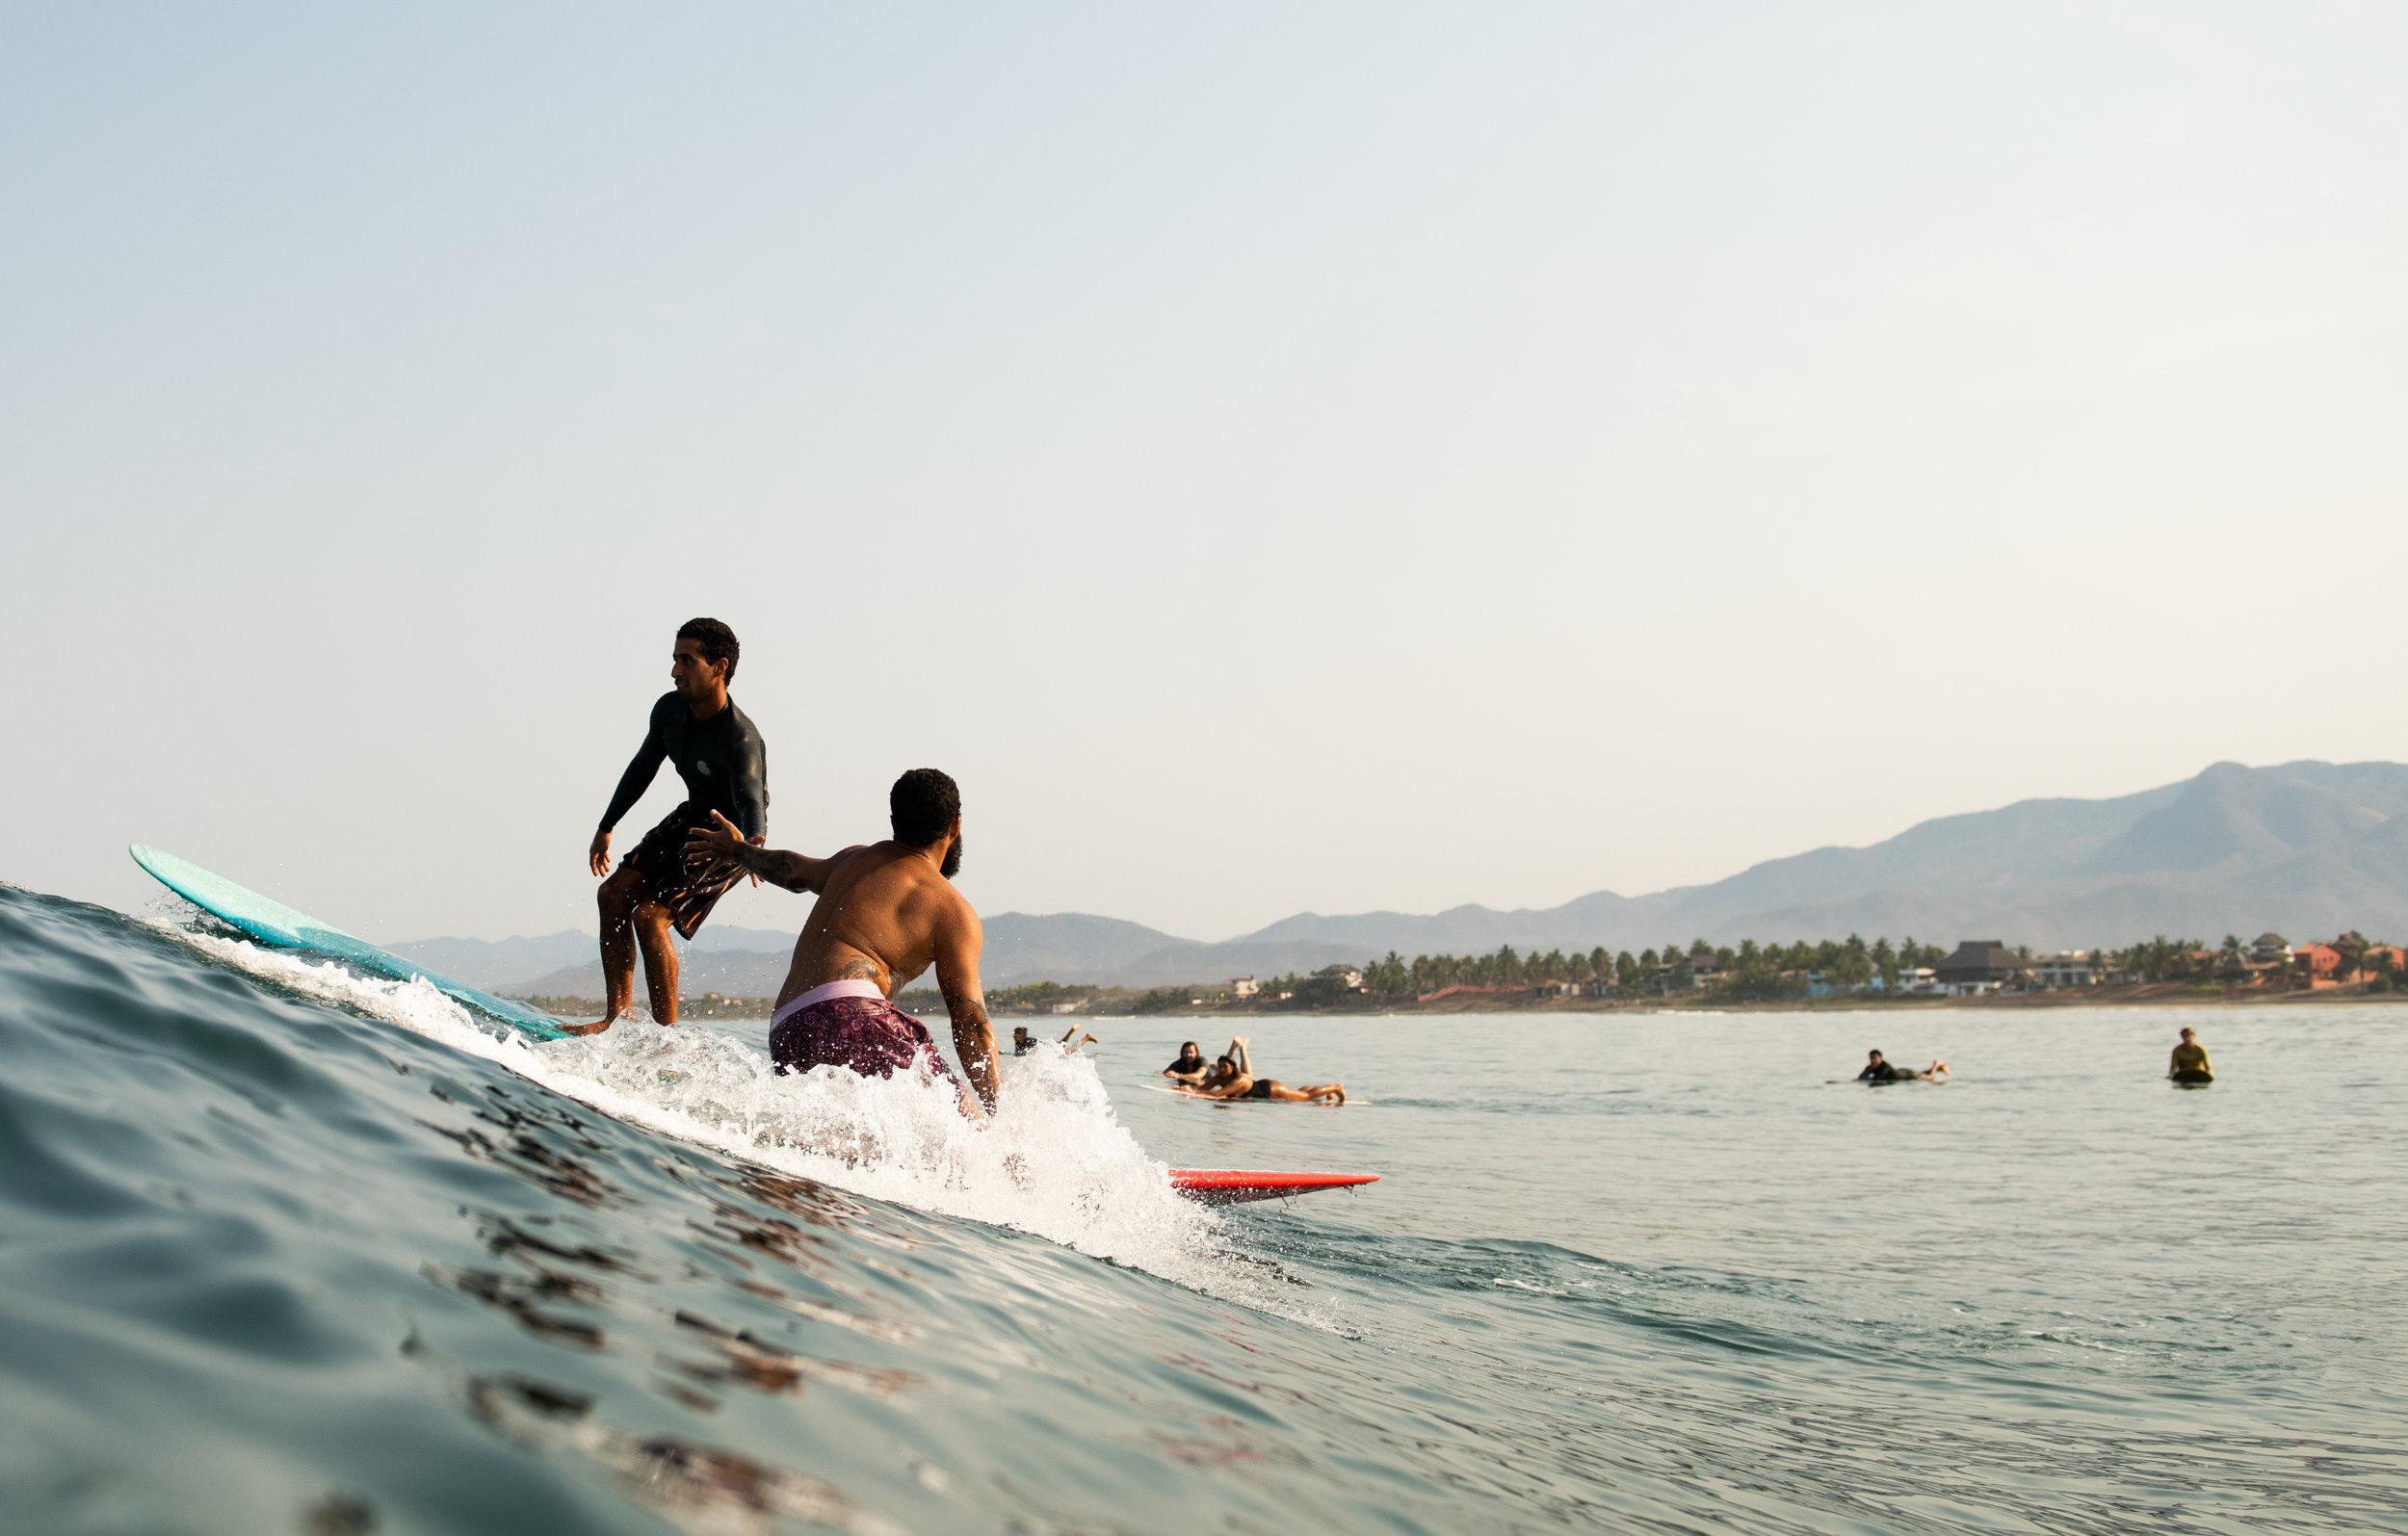 SURF_CAIO_BBRADLEY_-3-2.jpg